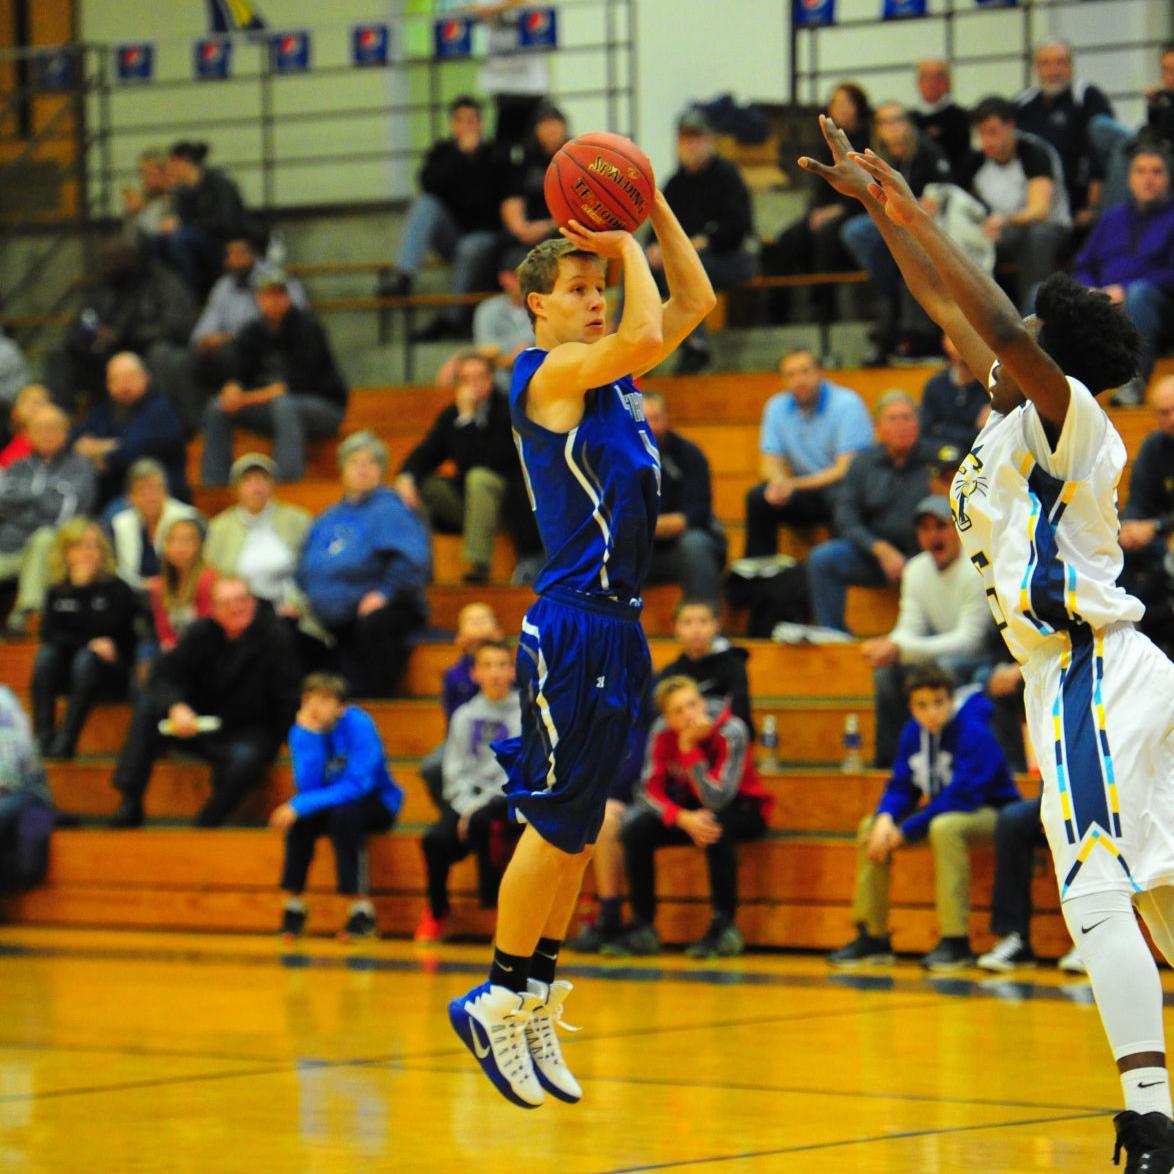 Boys Basketball — Washington vs. St. Louis Christian